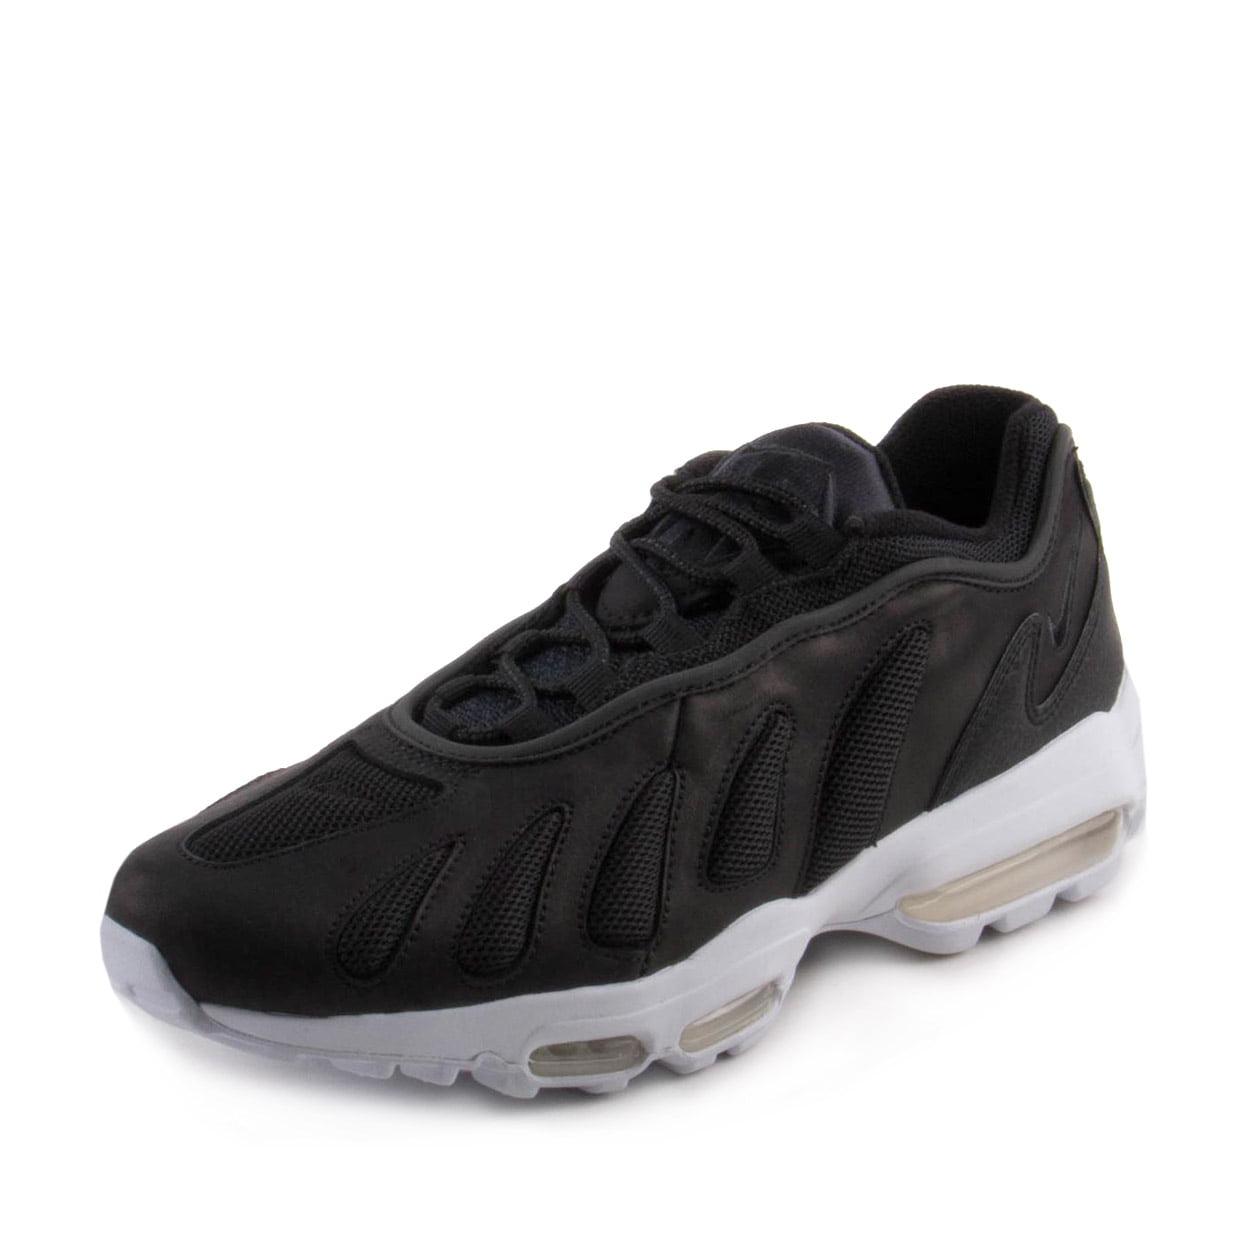 Nike - Nike Mens Air Max 96 XX Black